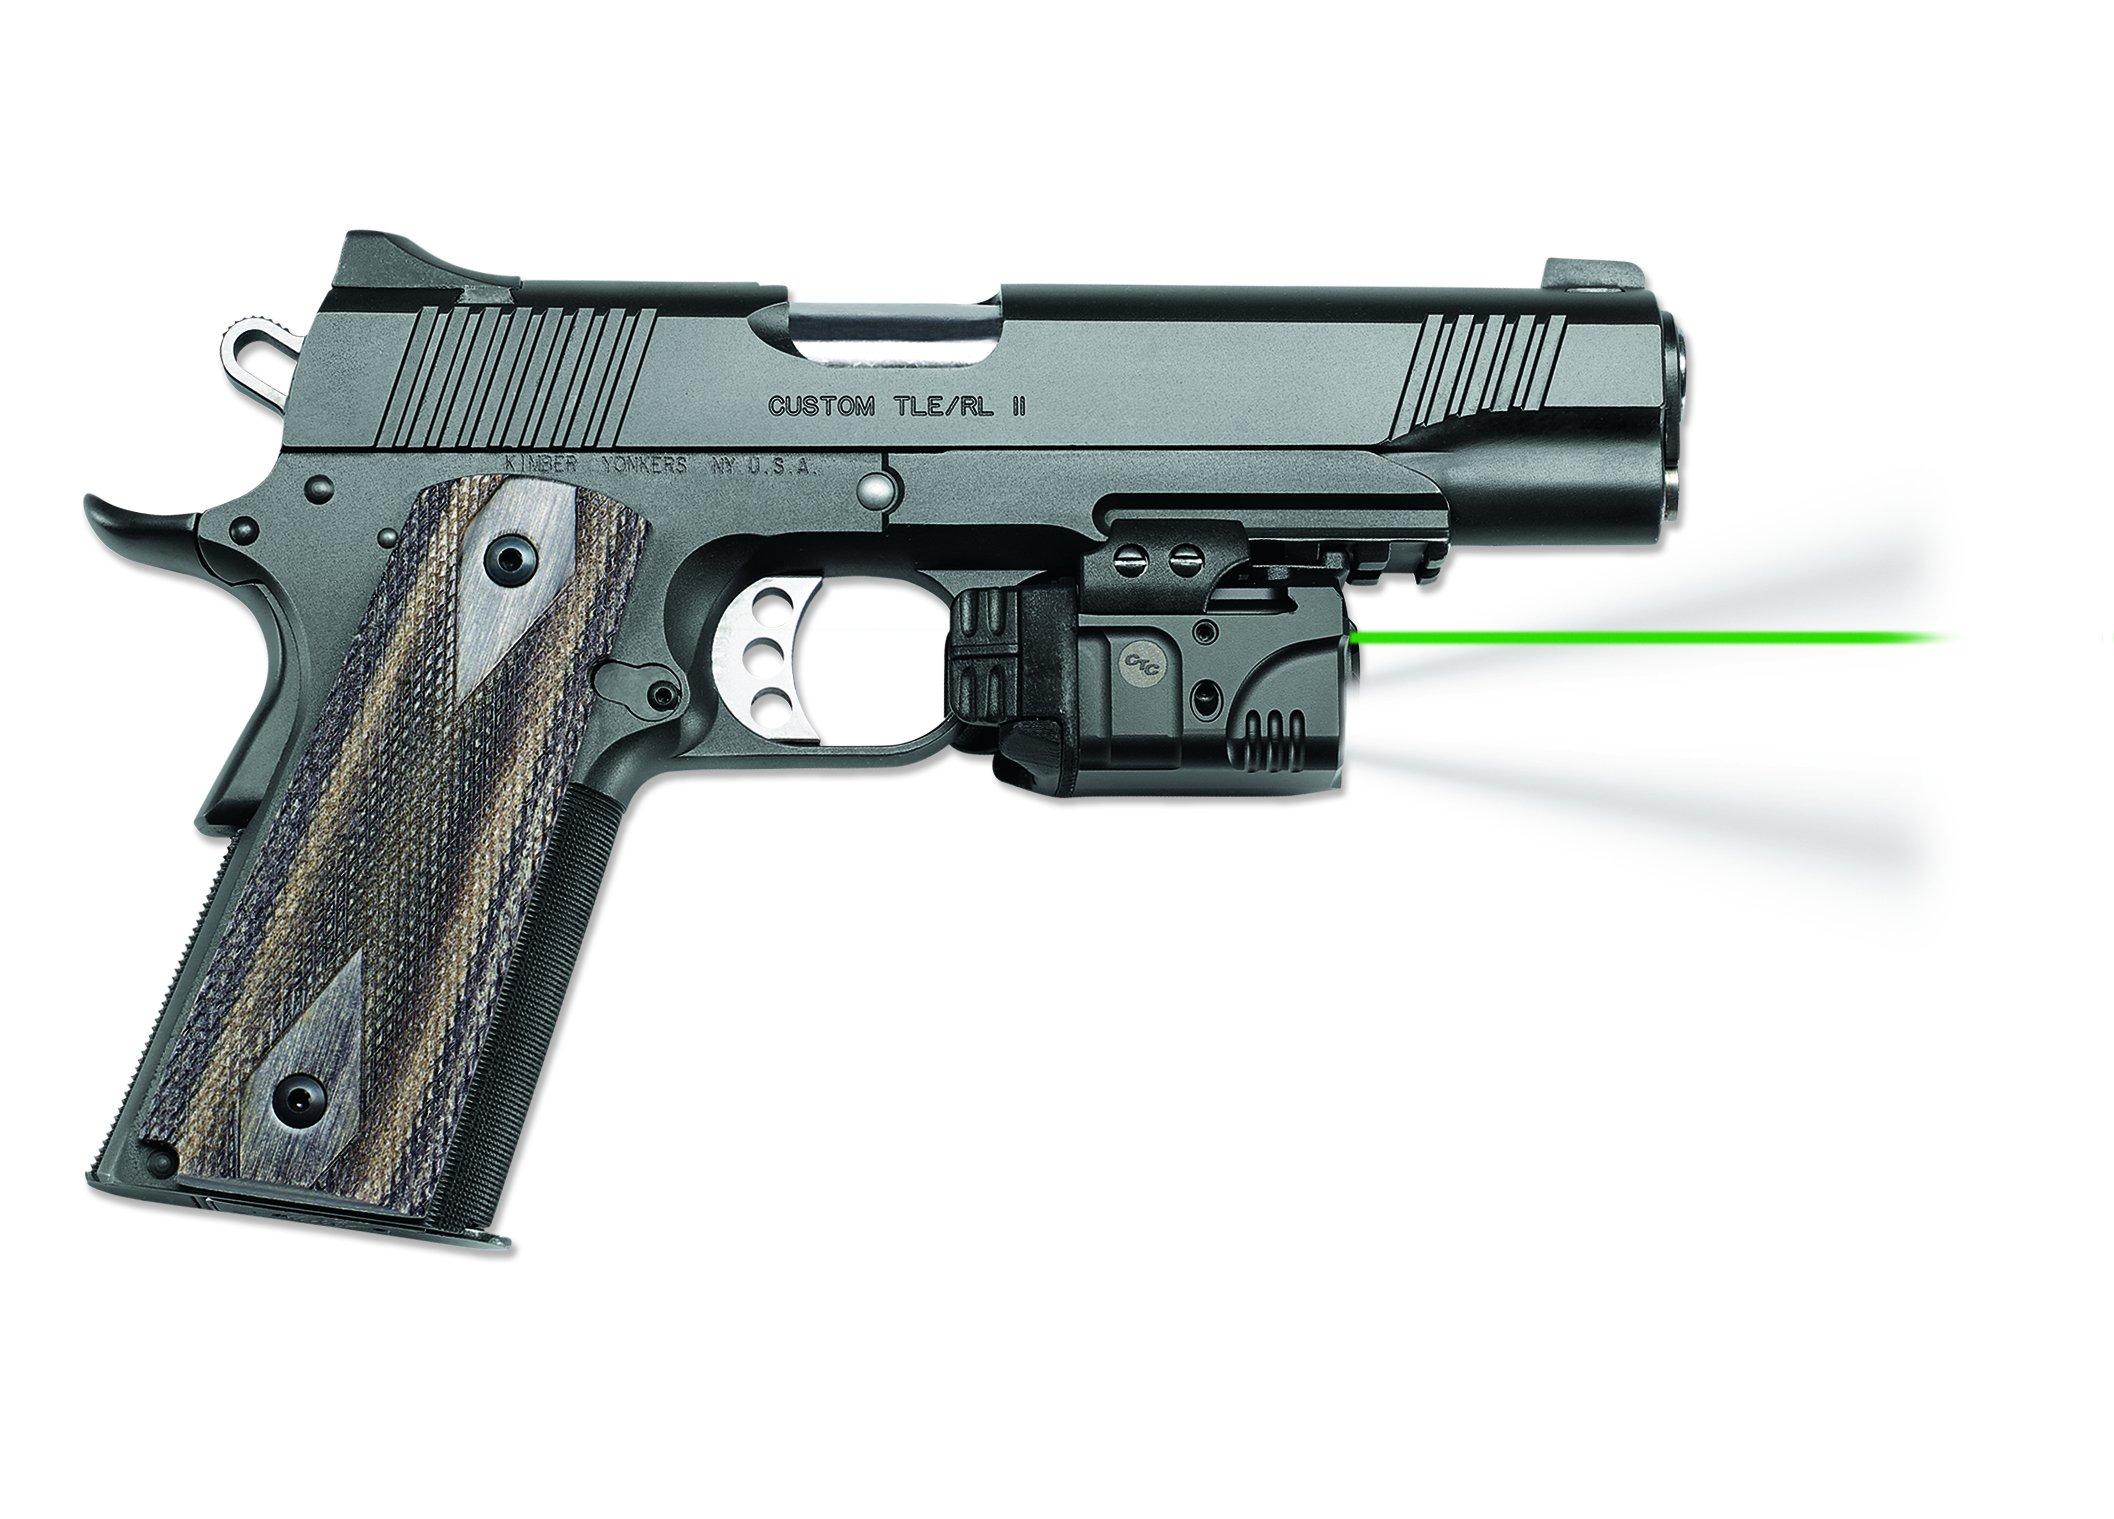 Crimson Trace CMR-204 Rail Master Pro Universal Green Laser & Tactical Light